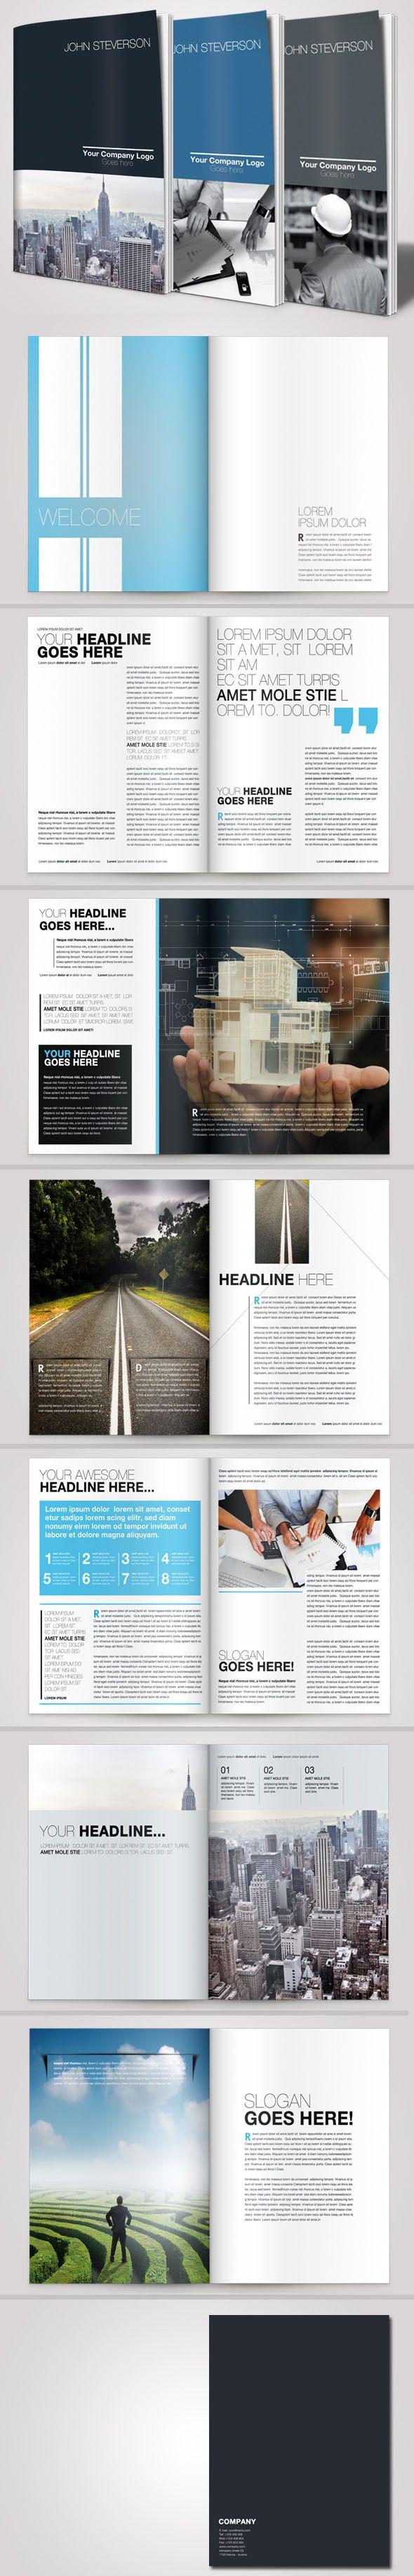 A4 Business Brochure Vol. 02 by Danijel Mokic, via Behance